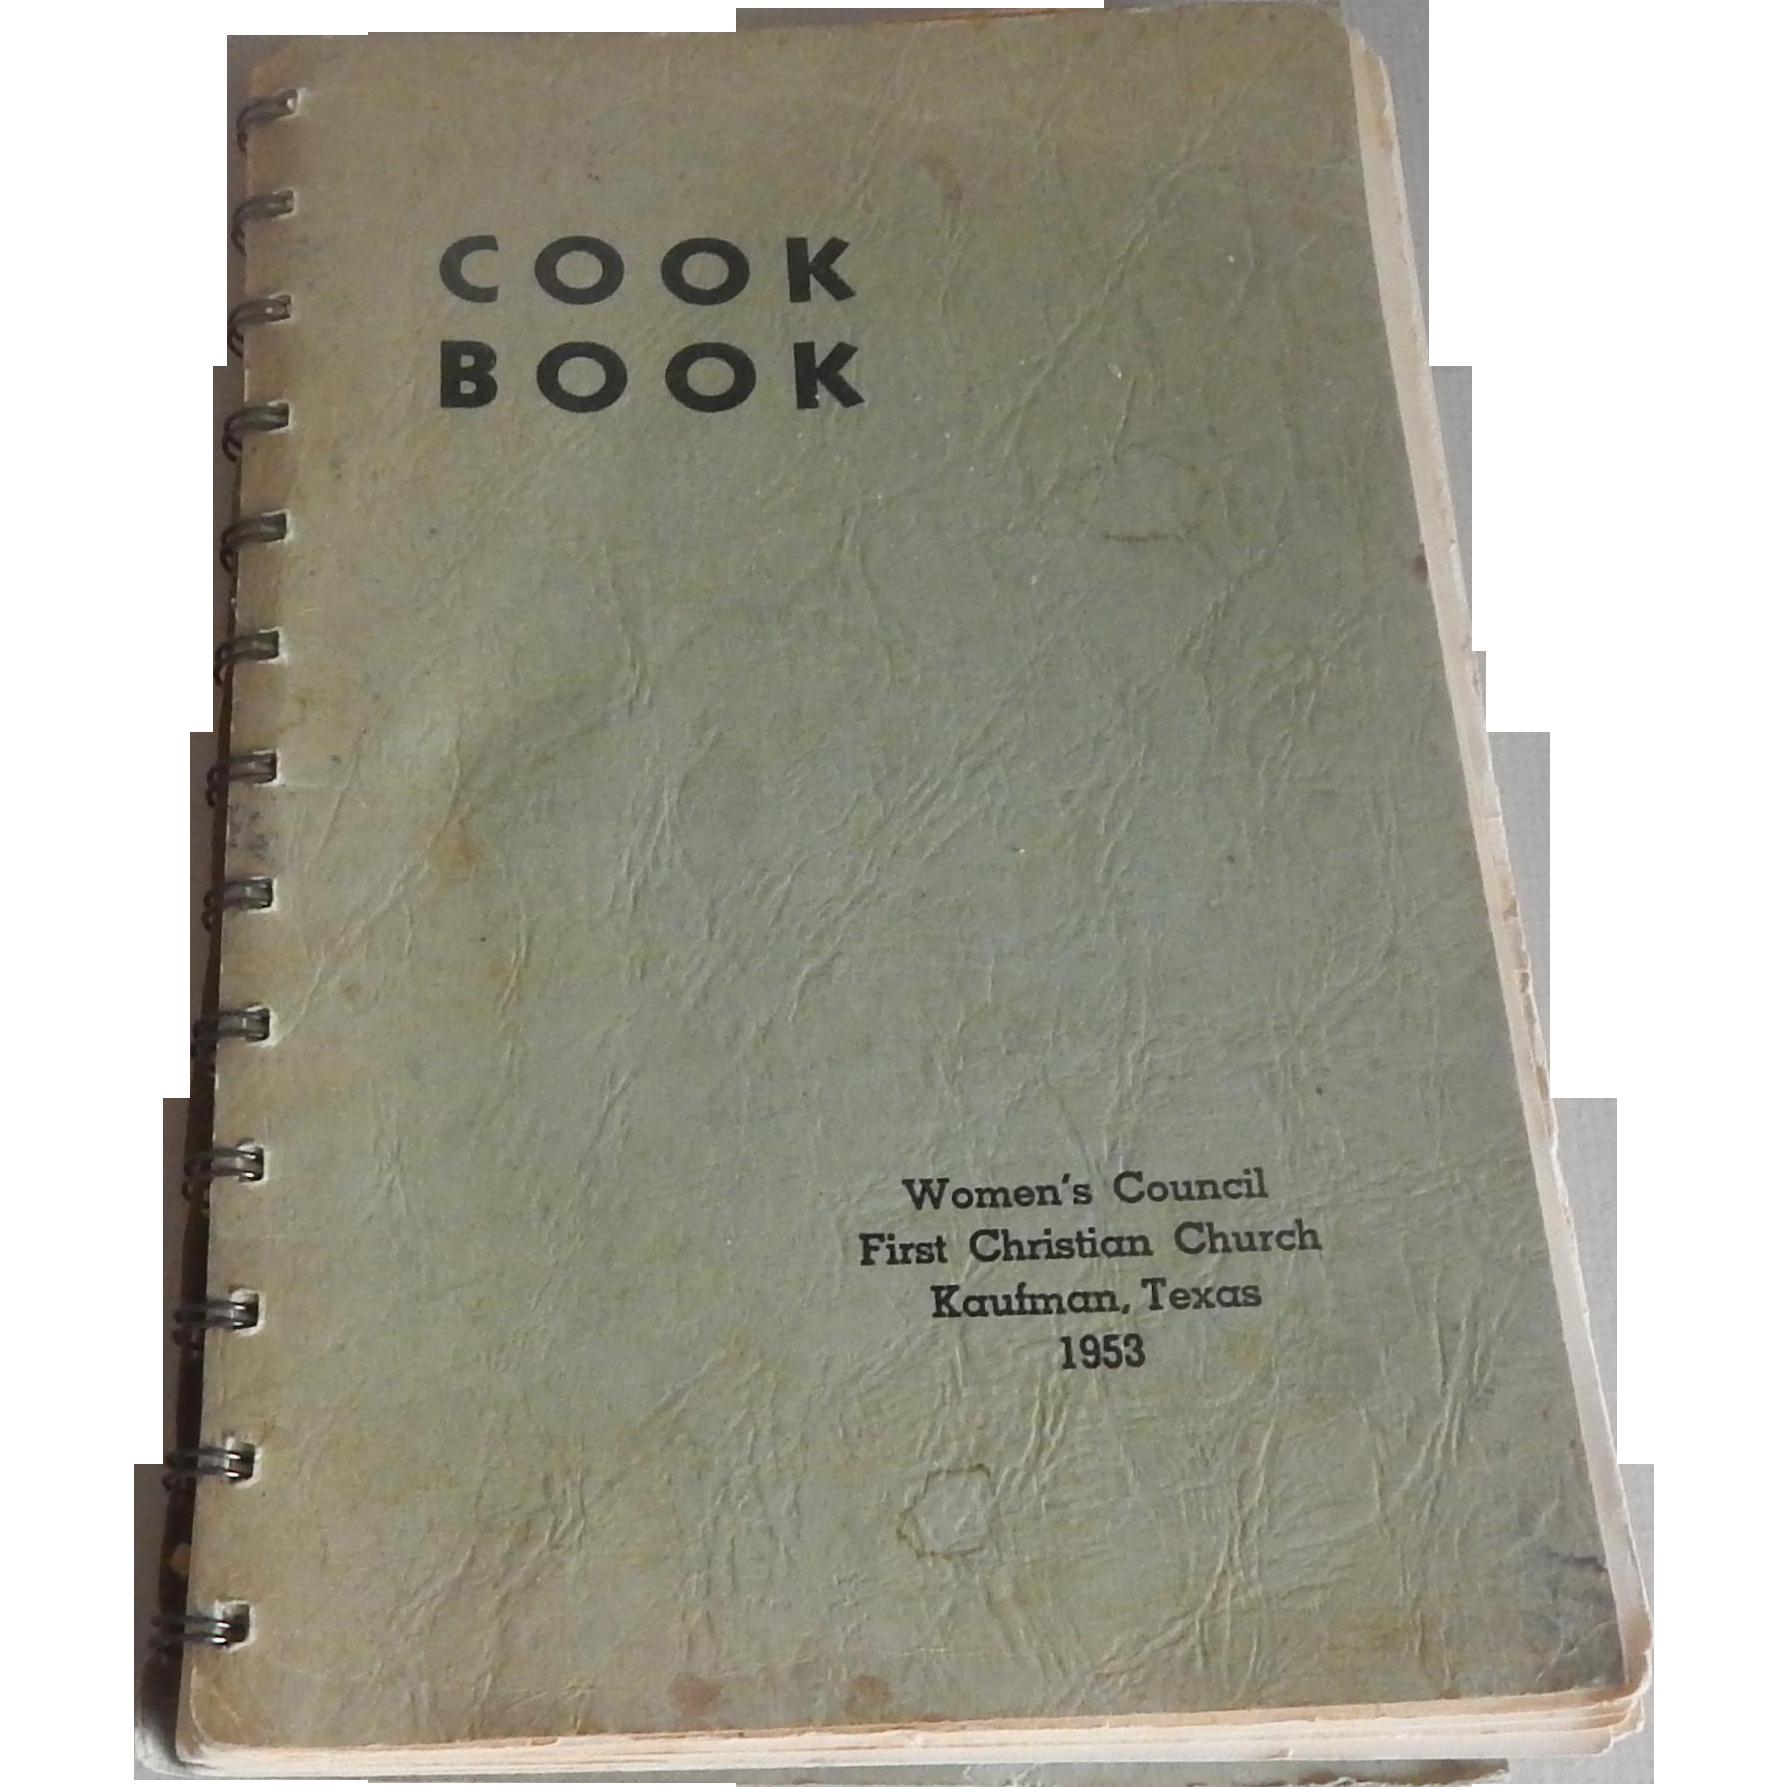 Kaufman Texas 1953 Cookbook